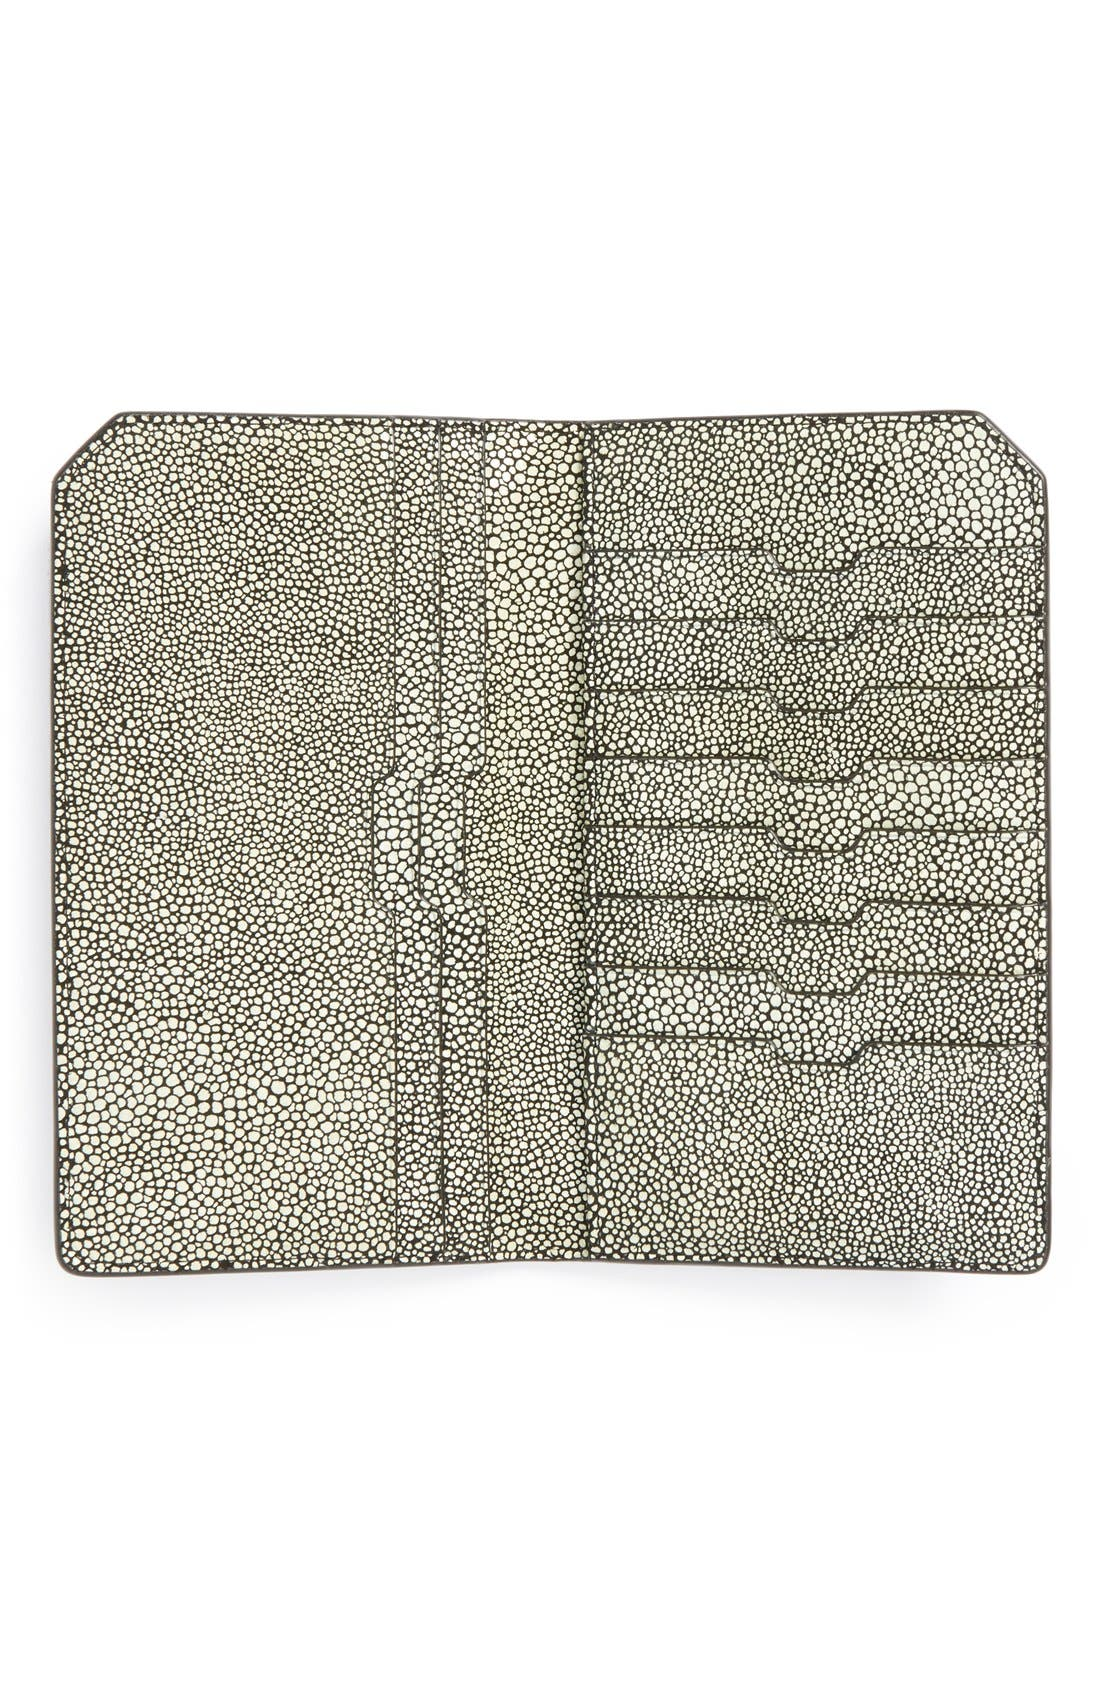 Ben Minkoff 'Orsay' Leather Passport Case,                             Alternate thumbnail 2, color,                             003